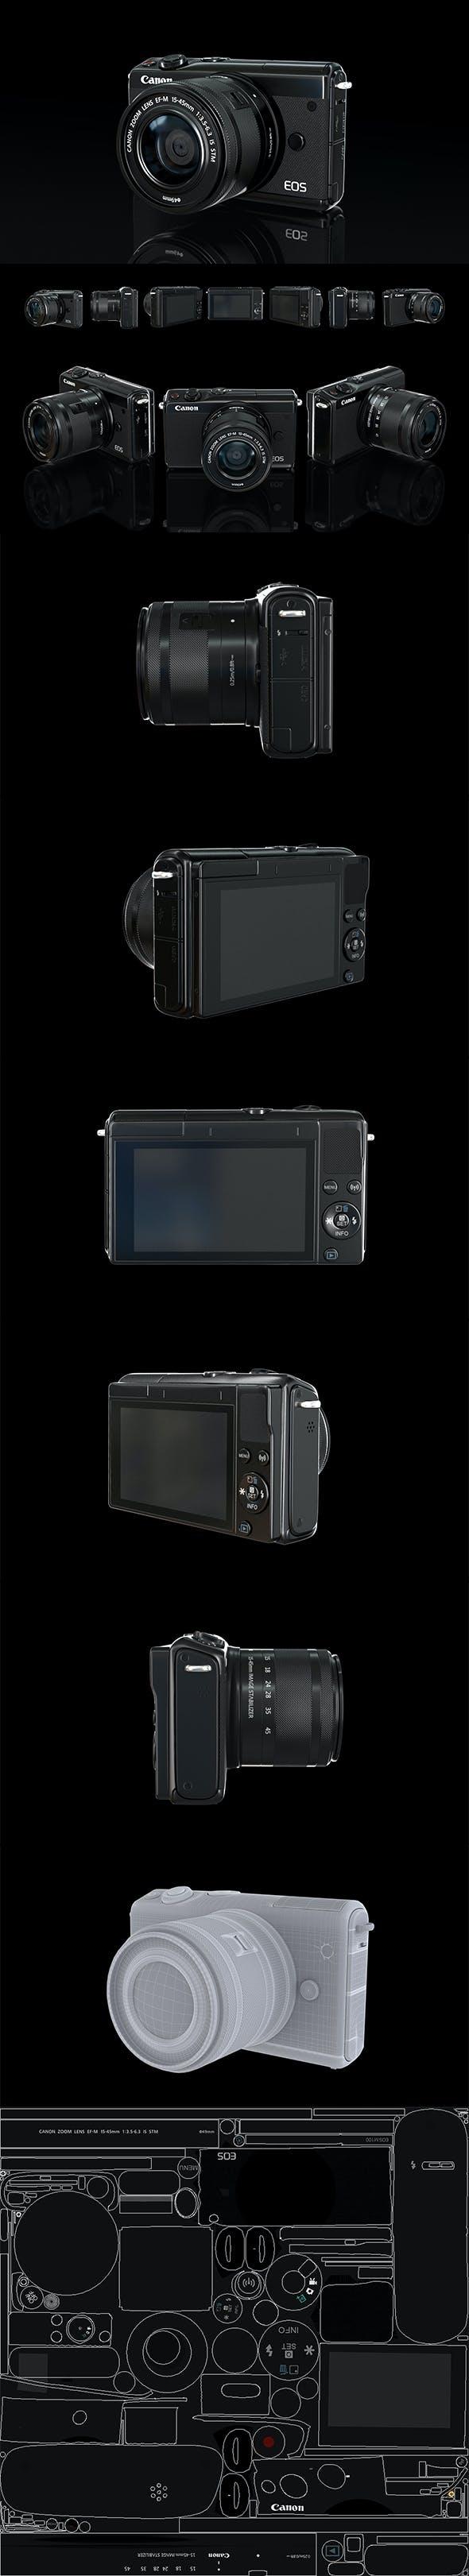 Canon eos m100 3D model - 3DOcean Item for Sale